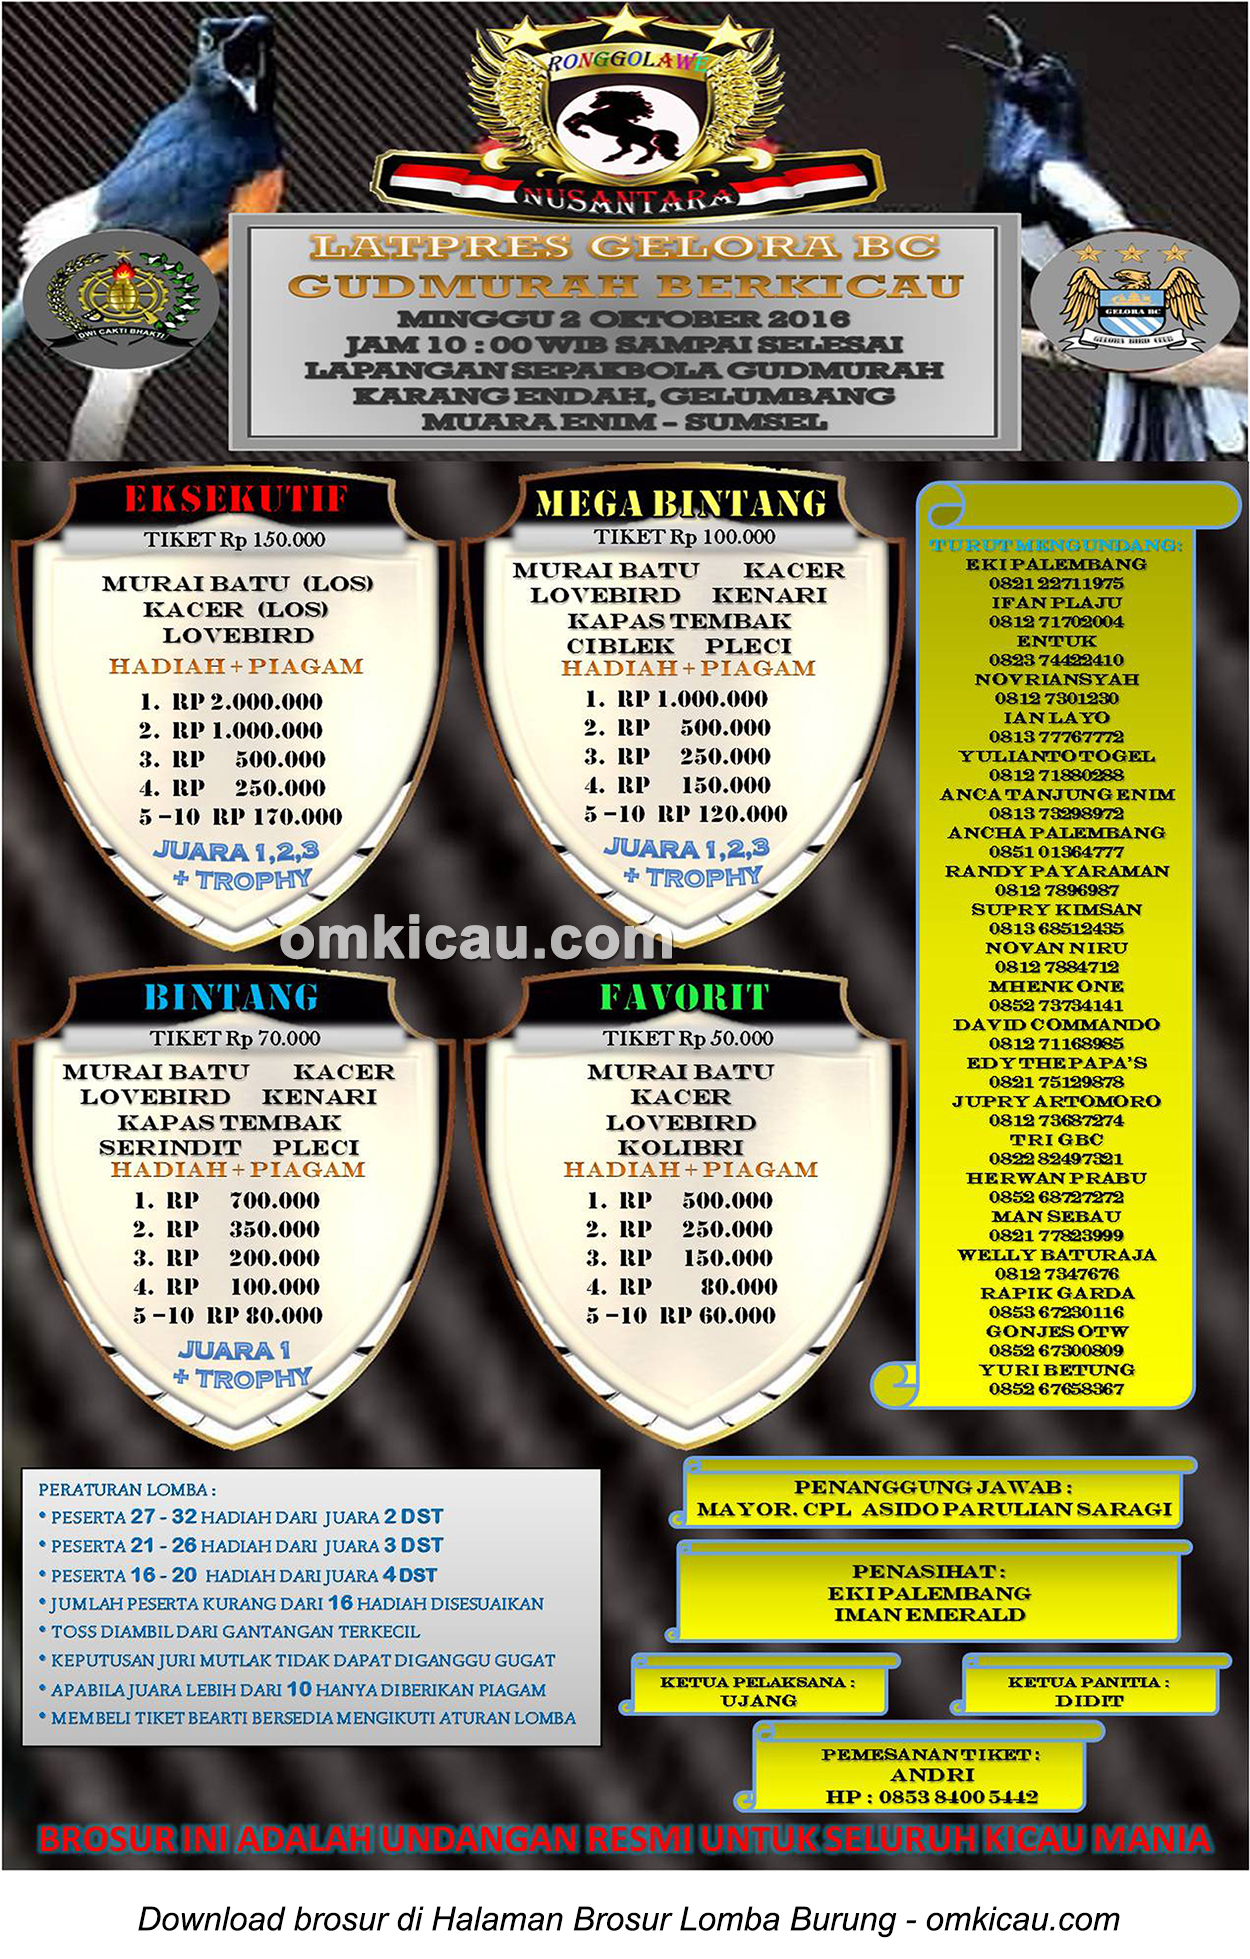 Brosur Latpres Gelora BC Gudmurah Berkicau, Muara Enim, 2 Oktober 2016